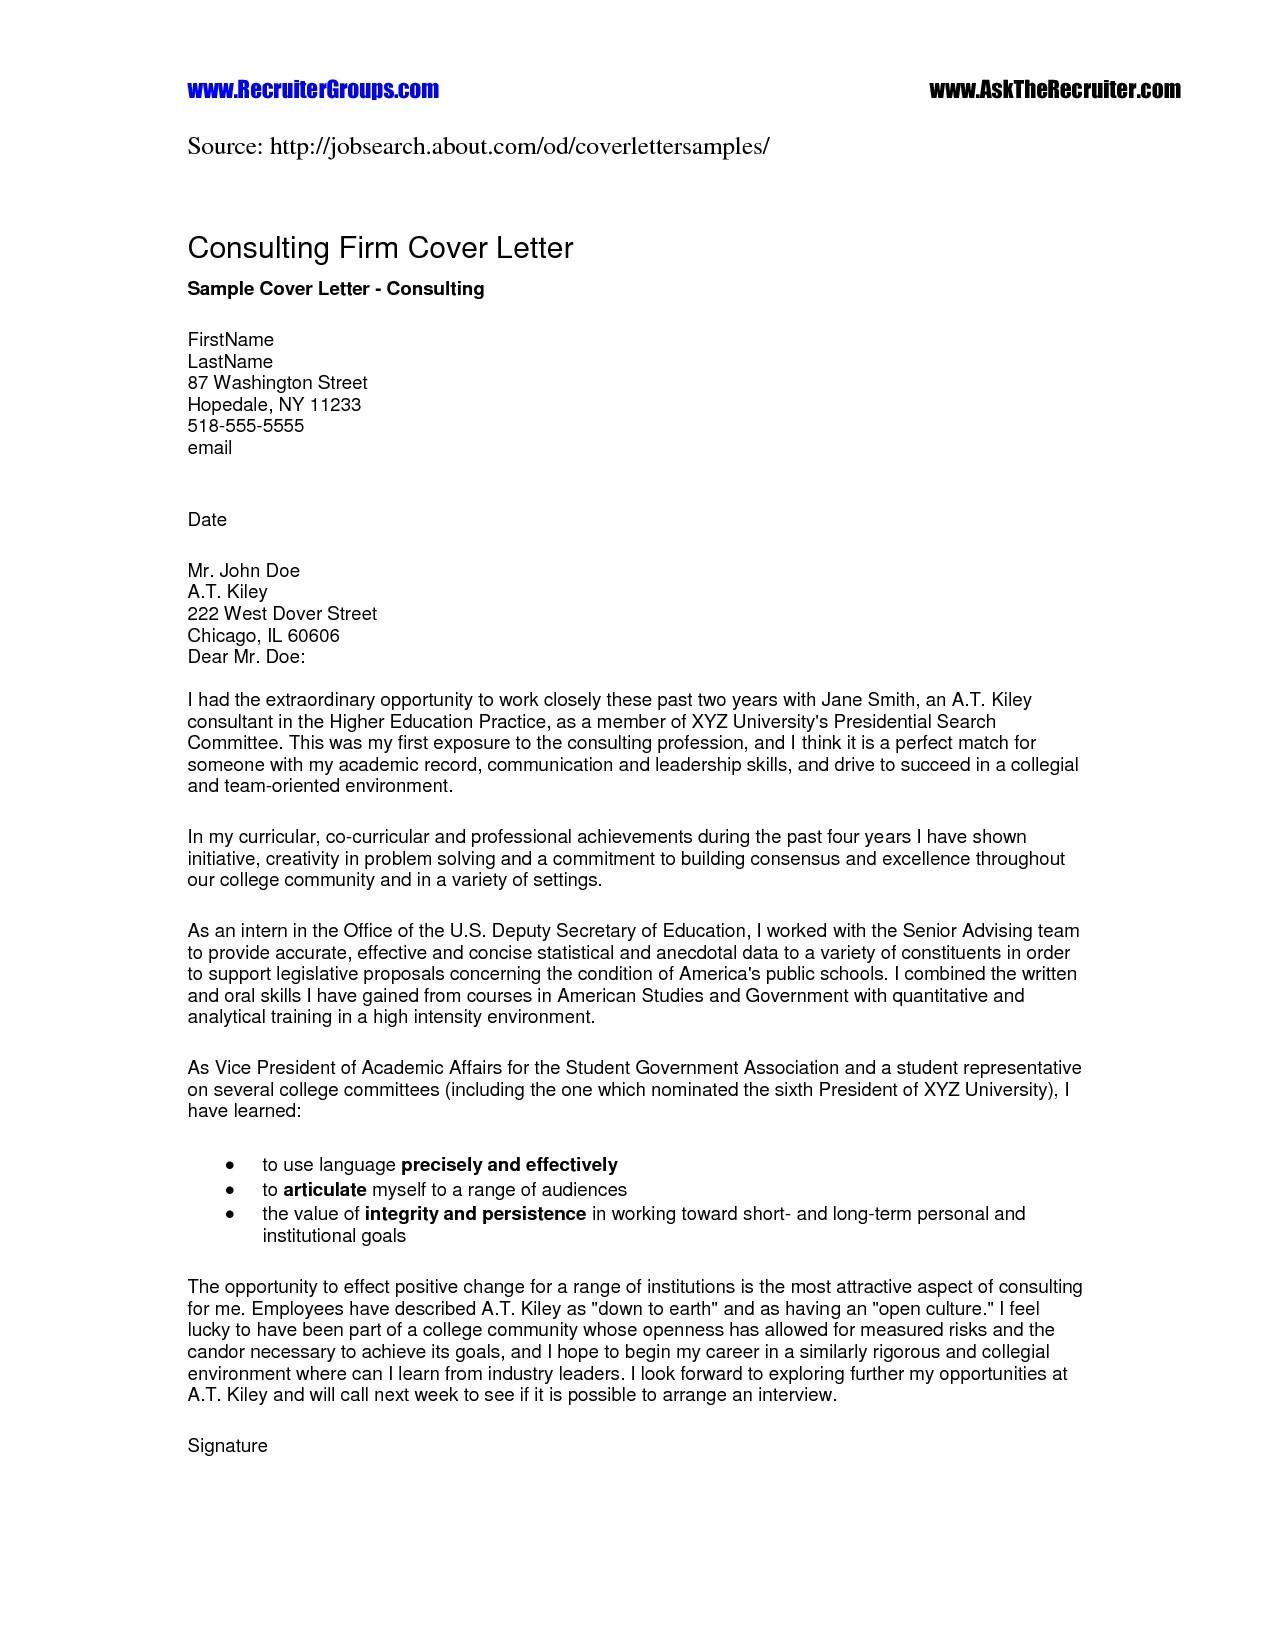 Letter Of Recommendation Template for Student - Letter Re Mendation for A Job Position New Fresh Job Fer Letter